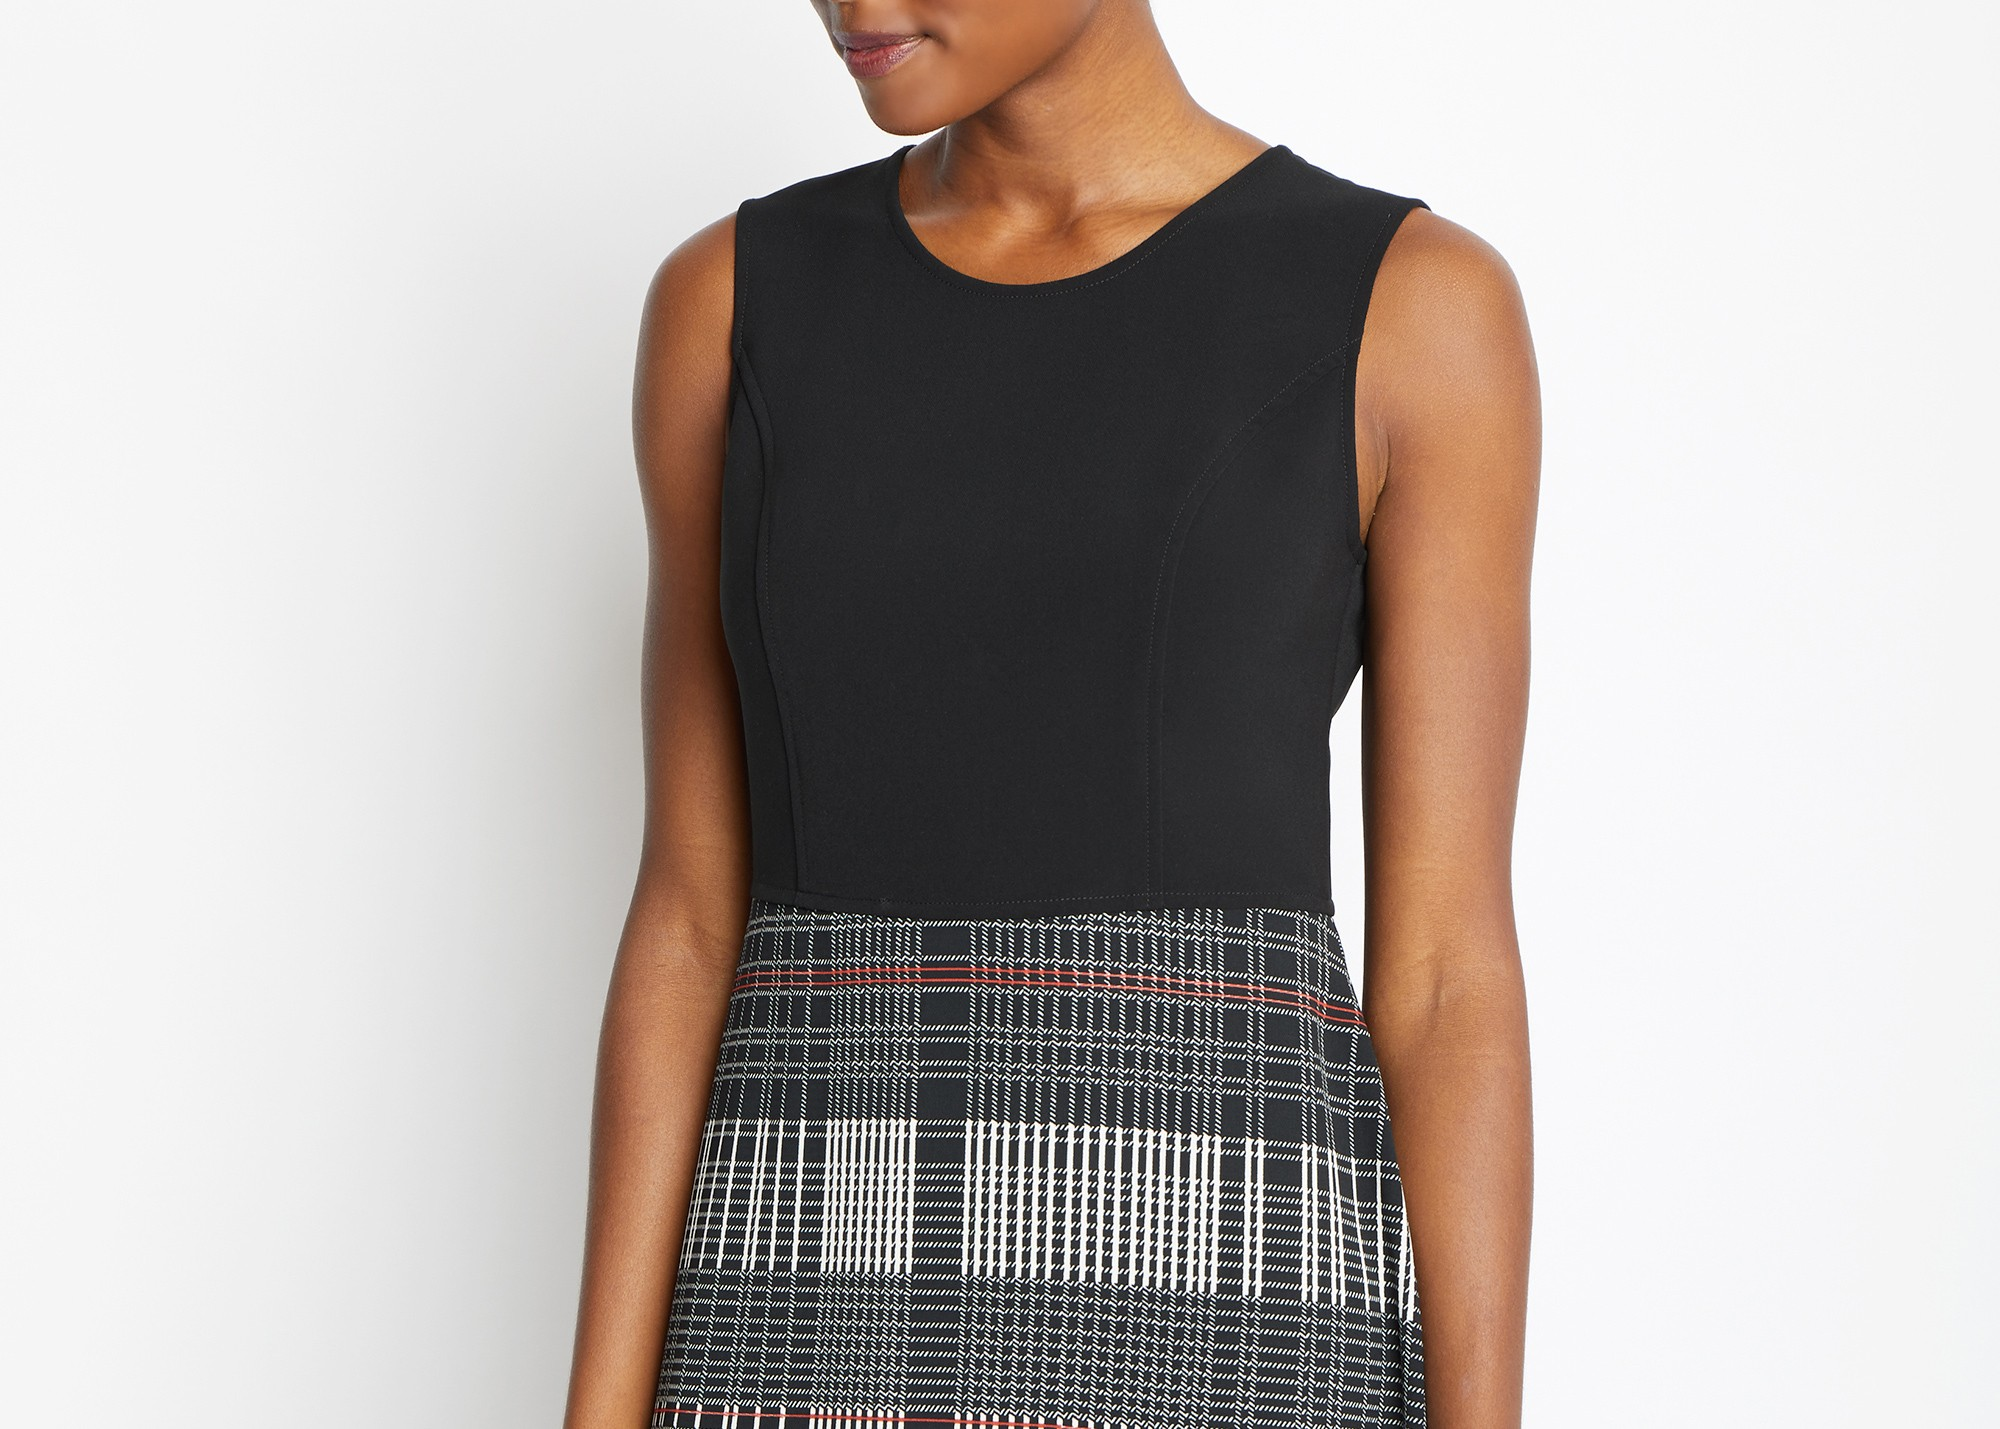 Of Mercer | Jefferson Dress Product Detail